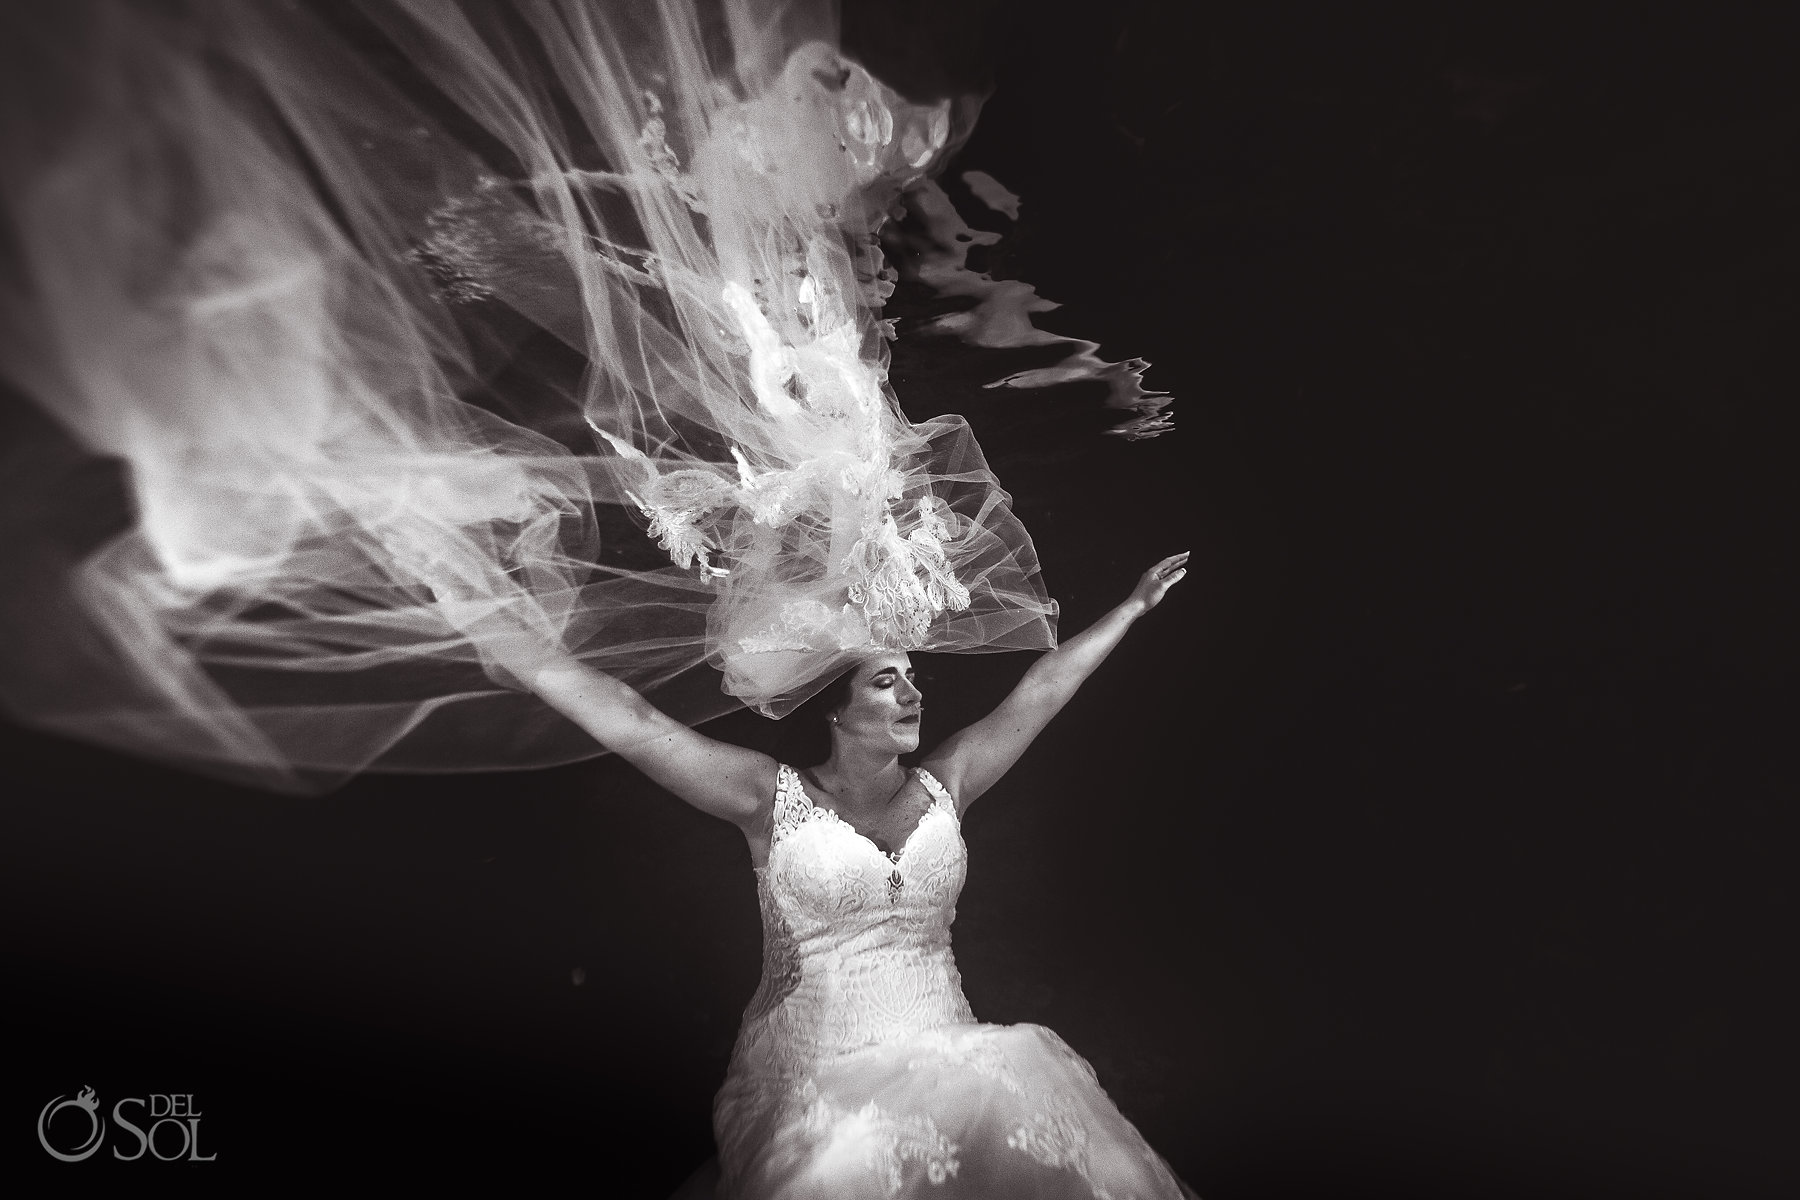 Tulum Cenote Experience underwater art photography